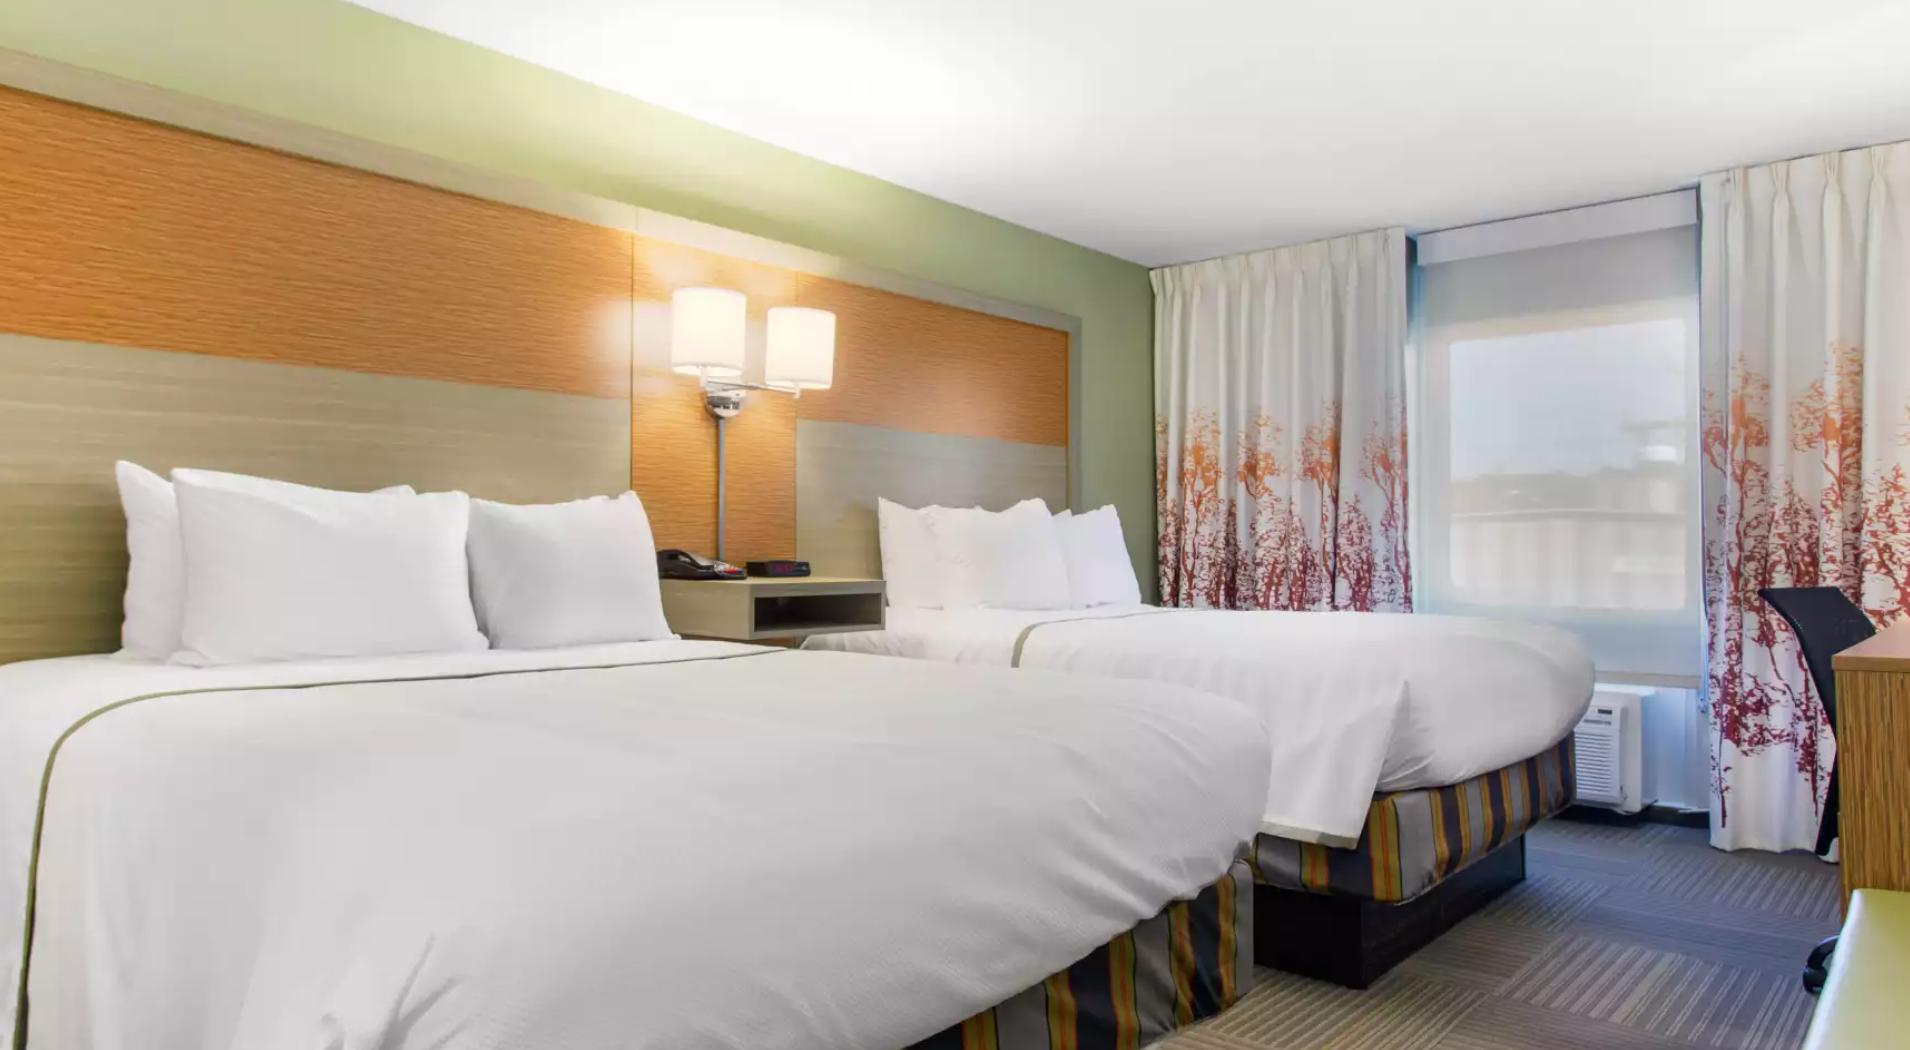 https://www.hotelsbyday.com/_data/default-hotel_image/3/19081/screenshot-2020-06-23-at-2-54-55-pm.png